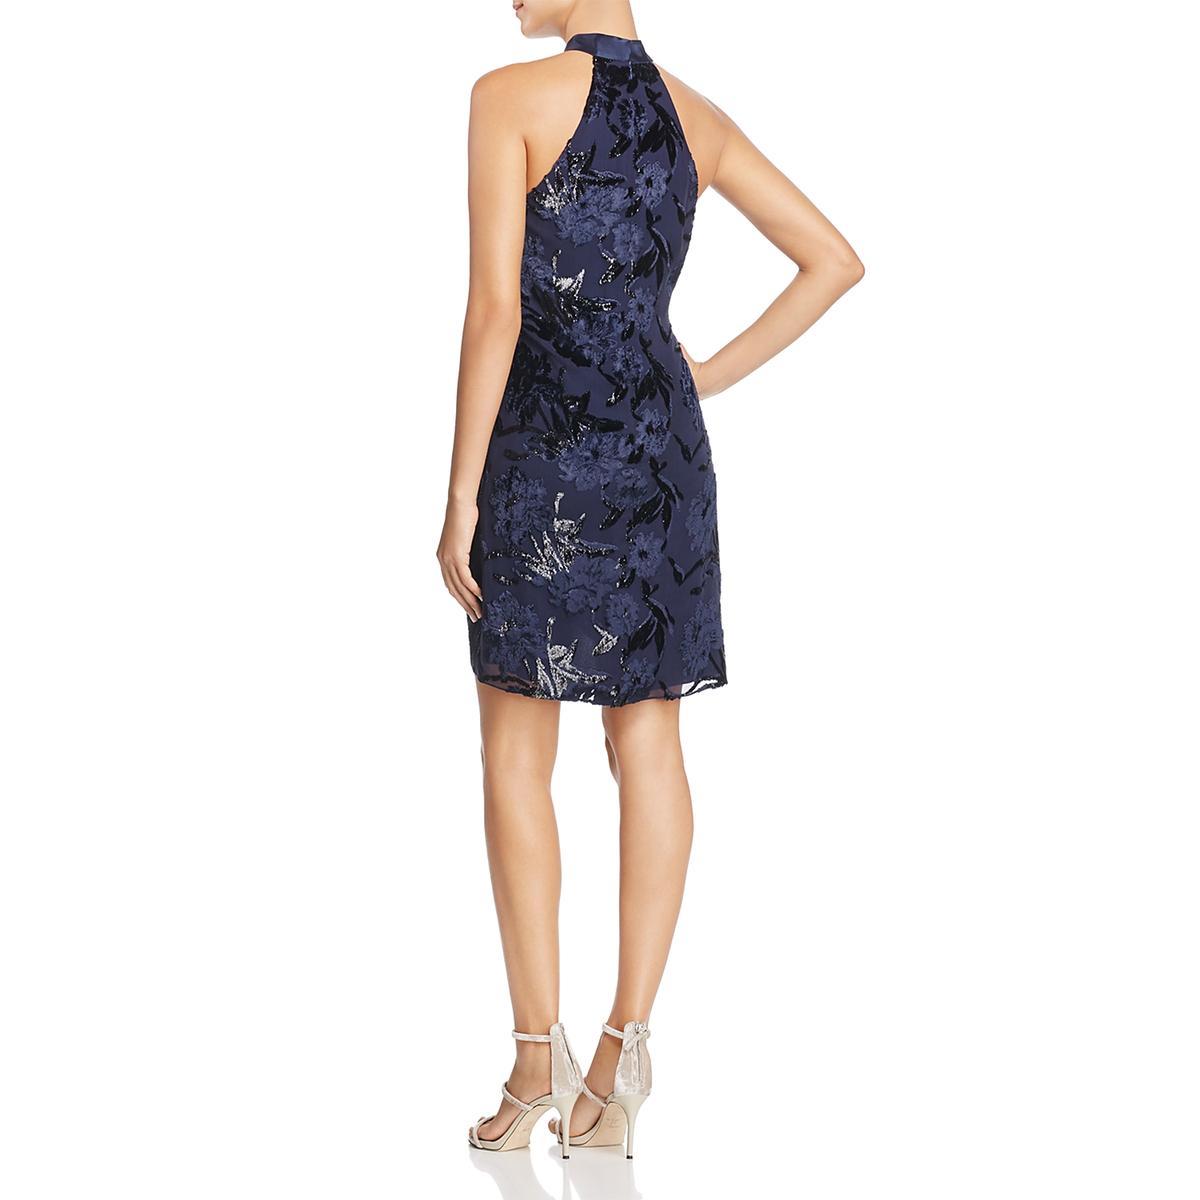 4224cb6fab Elie Tahari Womens Anika Dress 8 Regular for sale online